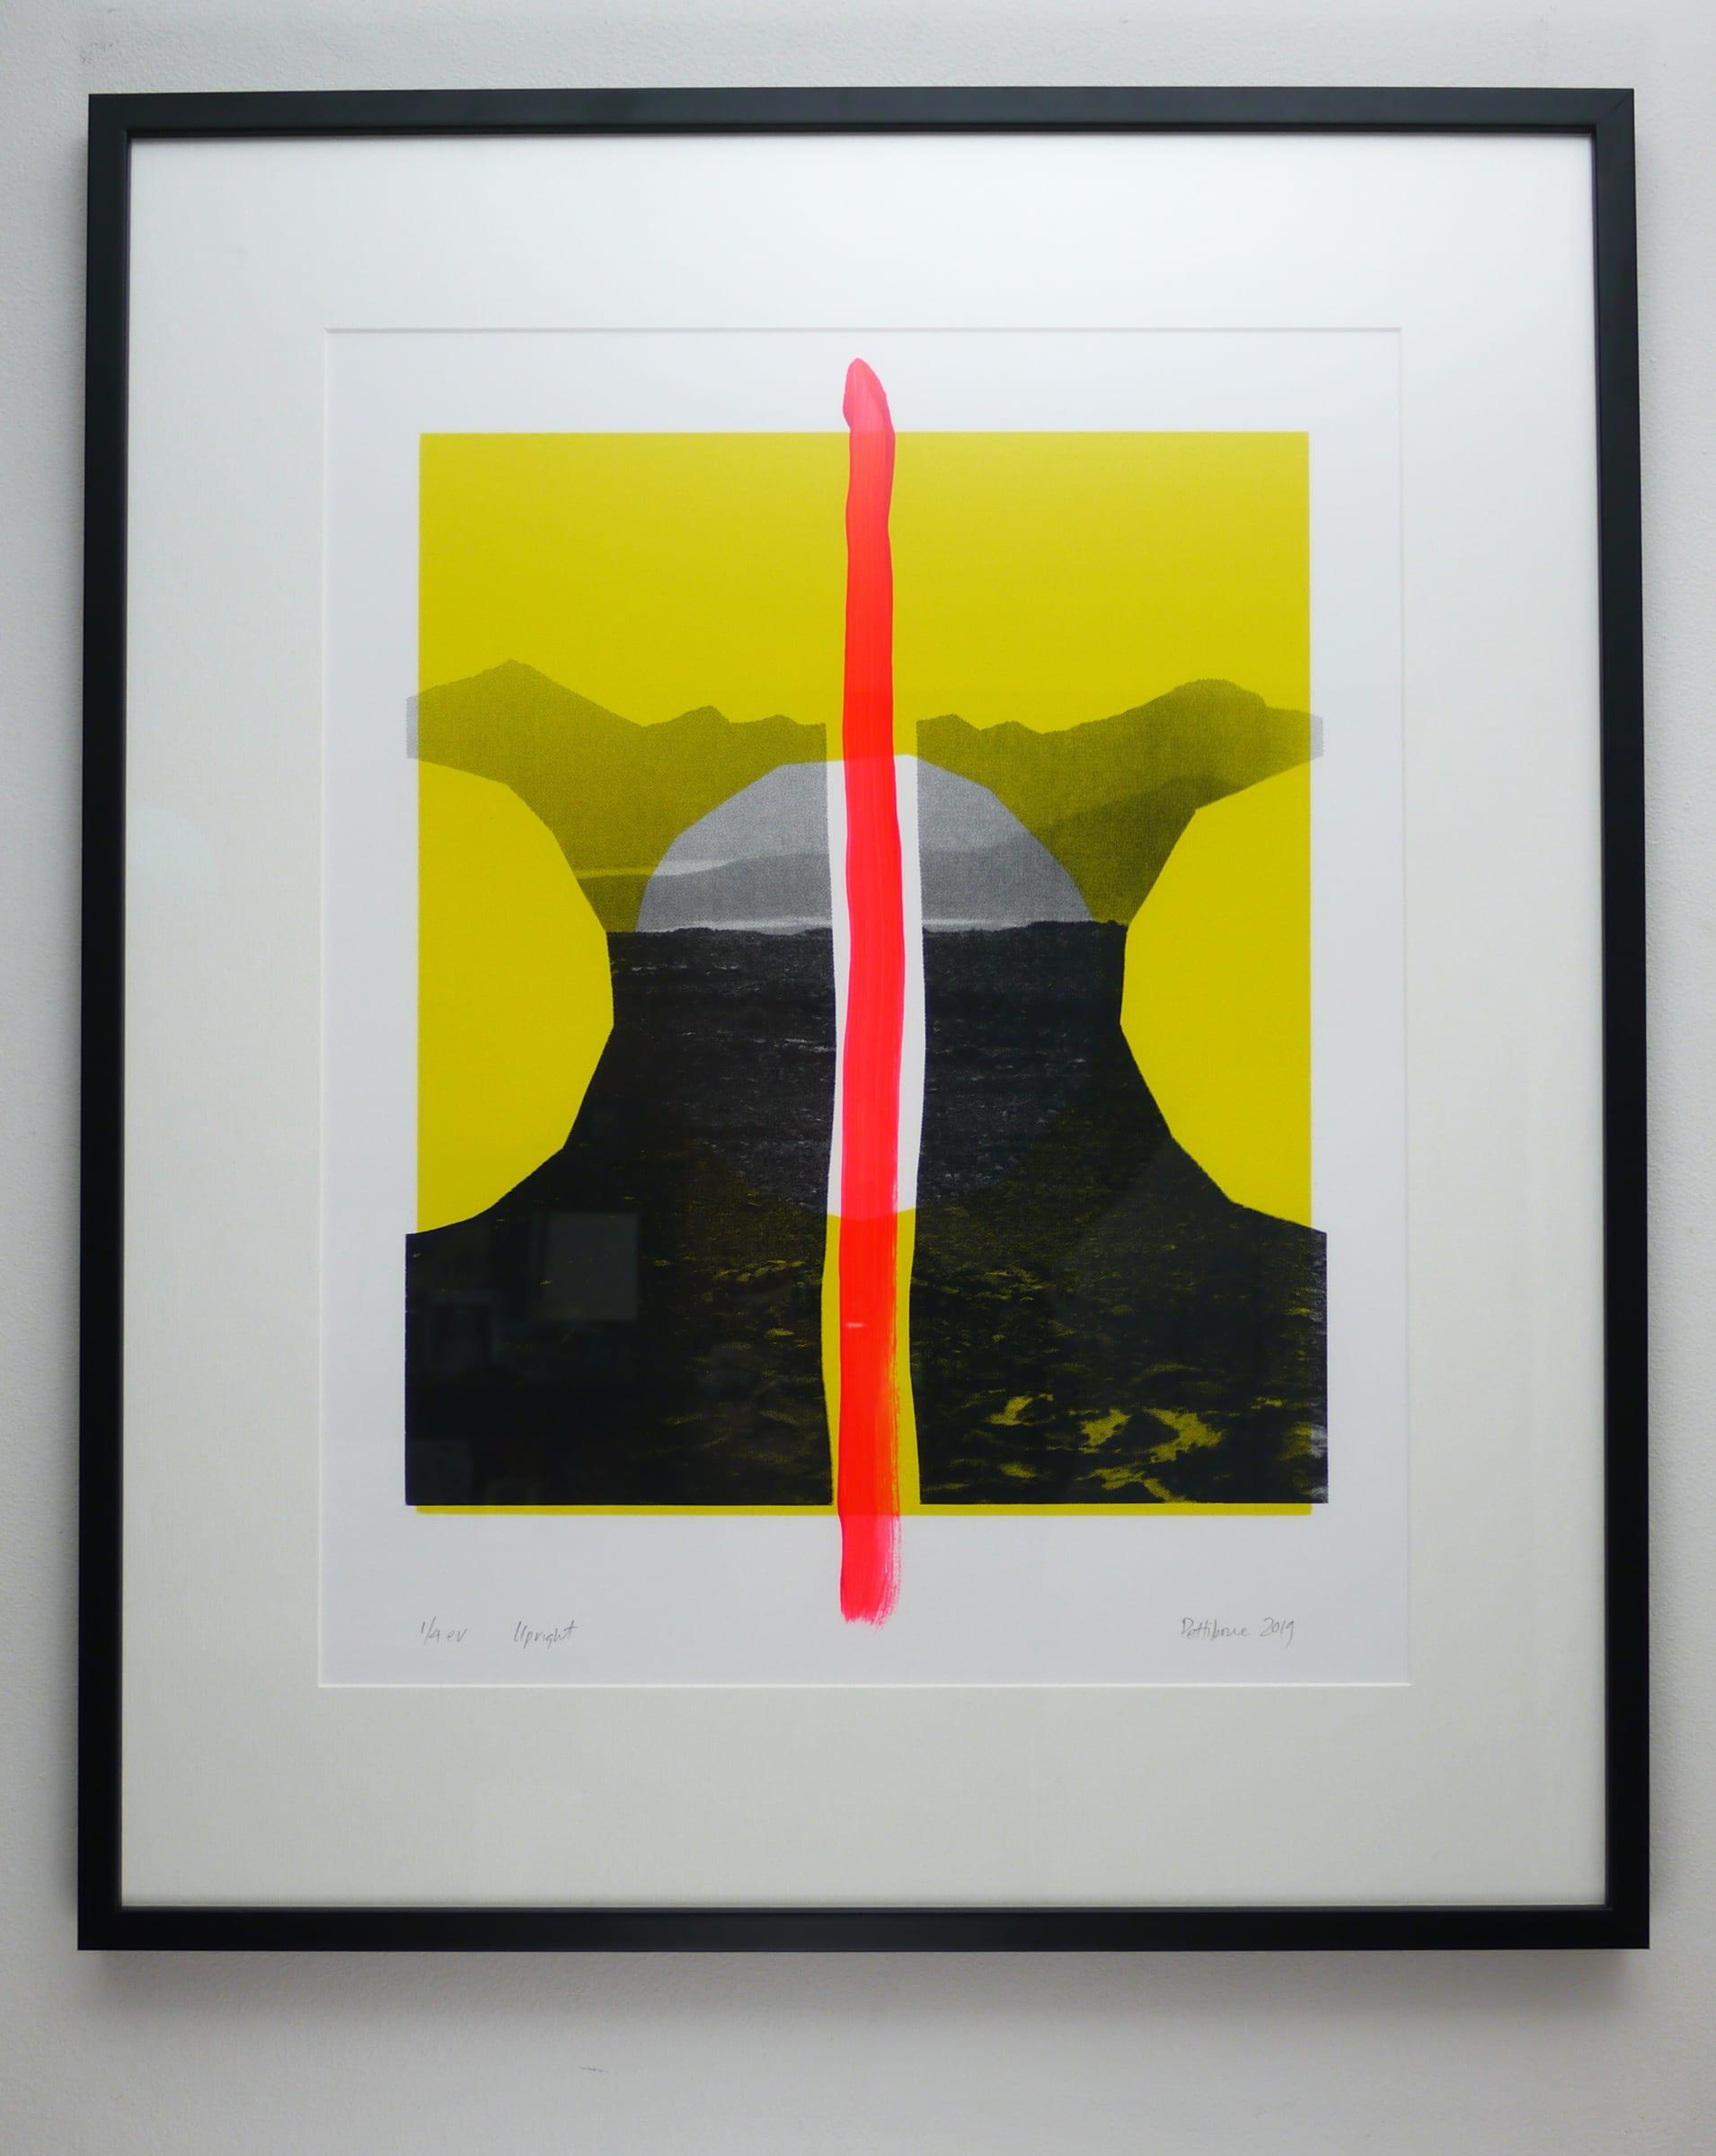 "<span class=""link fancybox-details-link""><a href=""/artists/194-lisa-pettibone/works/6666-lisa-pettibone-upright/"">View Detail Page</a></span><div class=""artist""><strong>Lisa Pettibone</strong></div> b. 1960 <div class=""title""><em>Upright</em></div> <div class=""medium"">Screen print, hand painted</div> <div class=""dimensions"">41 x 51cm</div> <div class=""edition_details"">variable edition 1 of 4</div><div class=""price"">£300.00</div><div class=""copyright_line"">Copyright The Artist</div>"